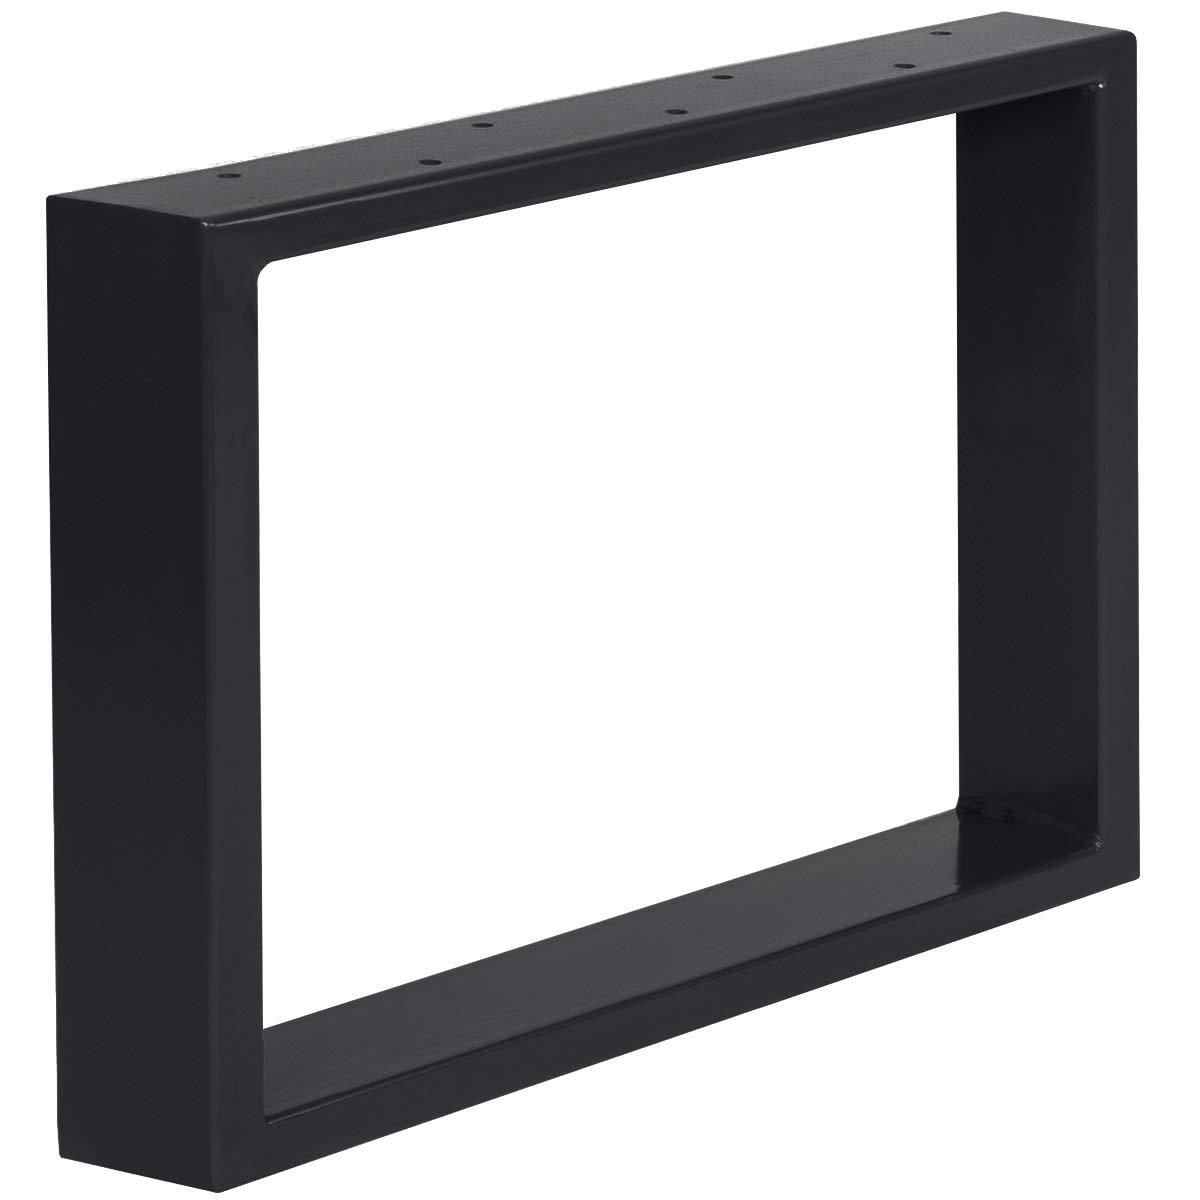 HLT-01-A-GG-9005 Cadre 90x72 cm Noir Fonc/é HOLZBRINK 1x Pied de Table en Profil/és dAcier 100x20 mm